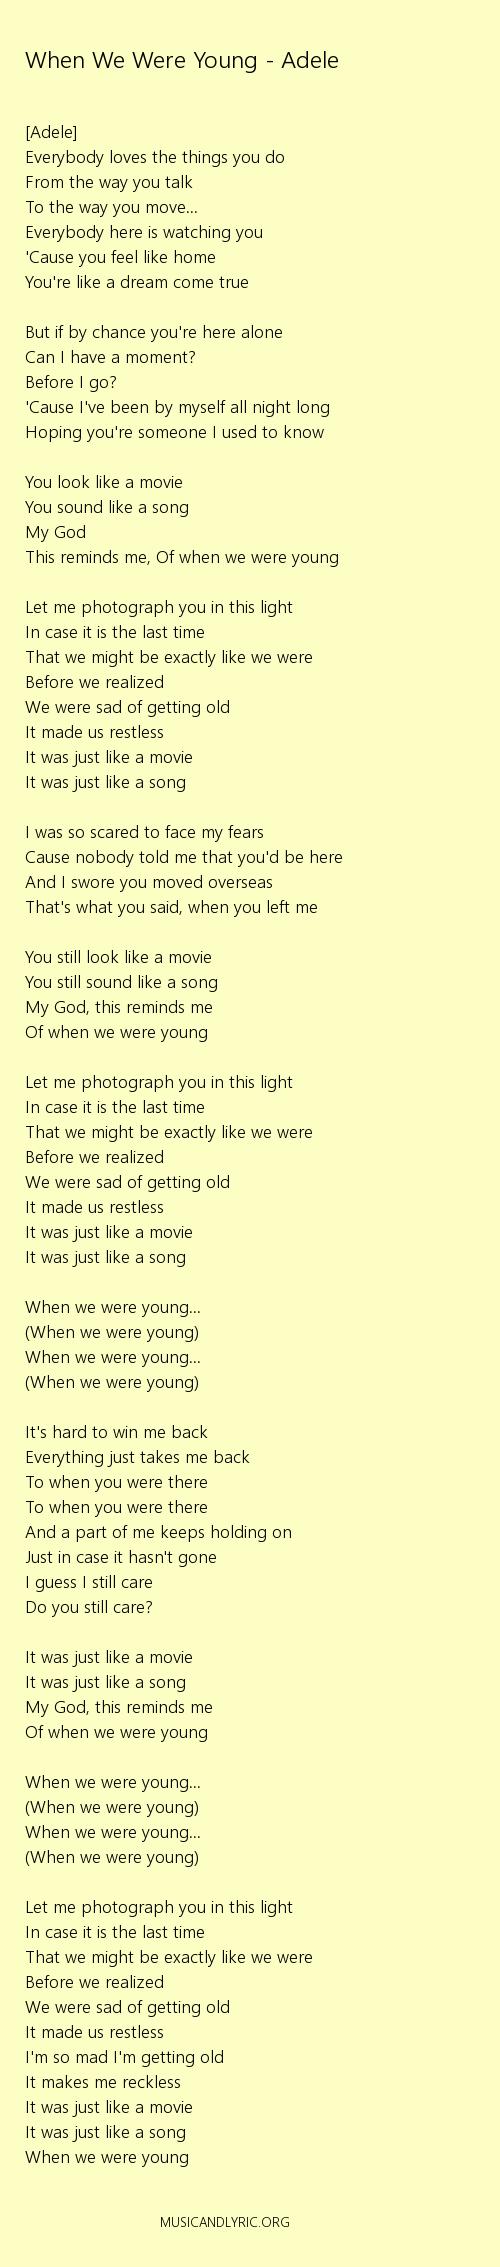 Adele - When We Were Young lyrics. pdf - Musicandlyrics | Adele songs lyrics. Adele lyrics. Adele songs